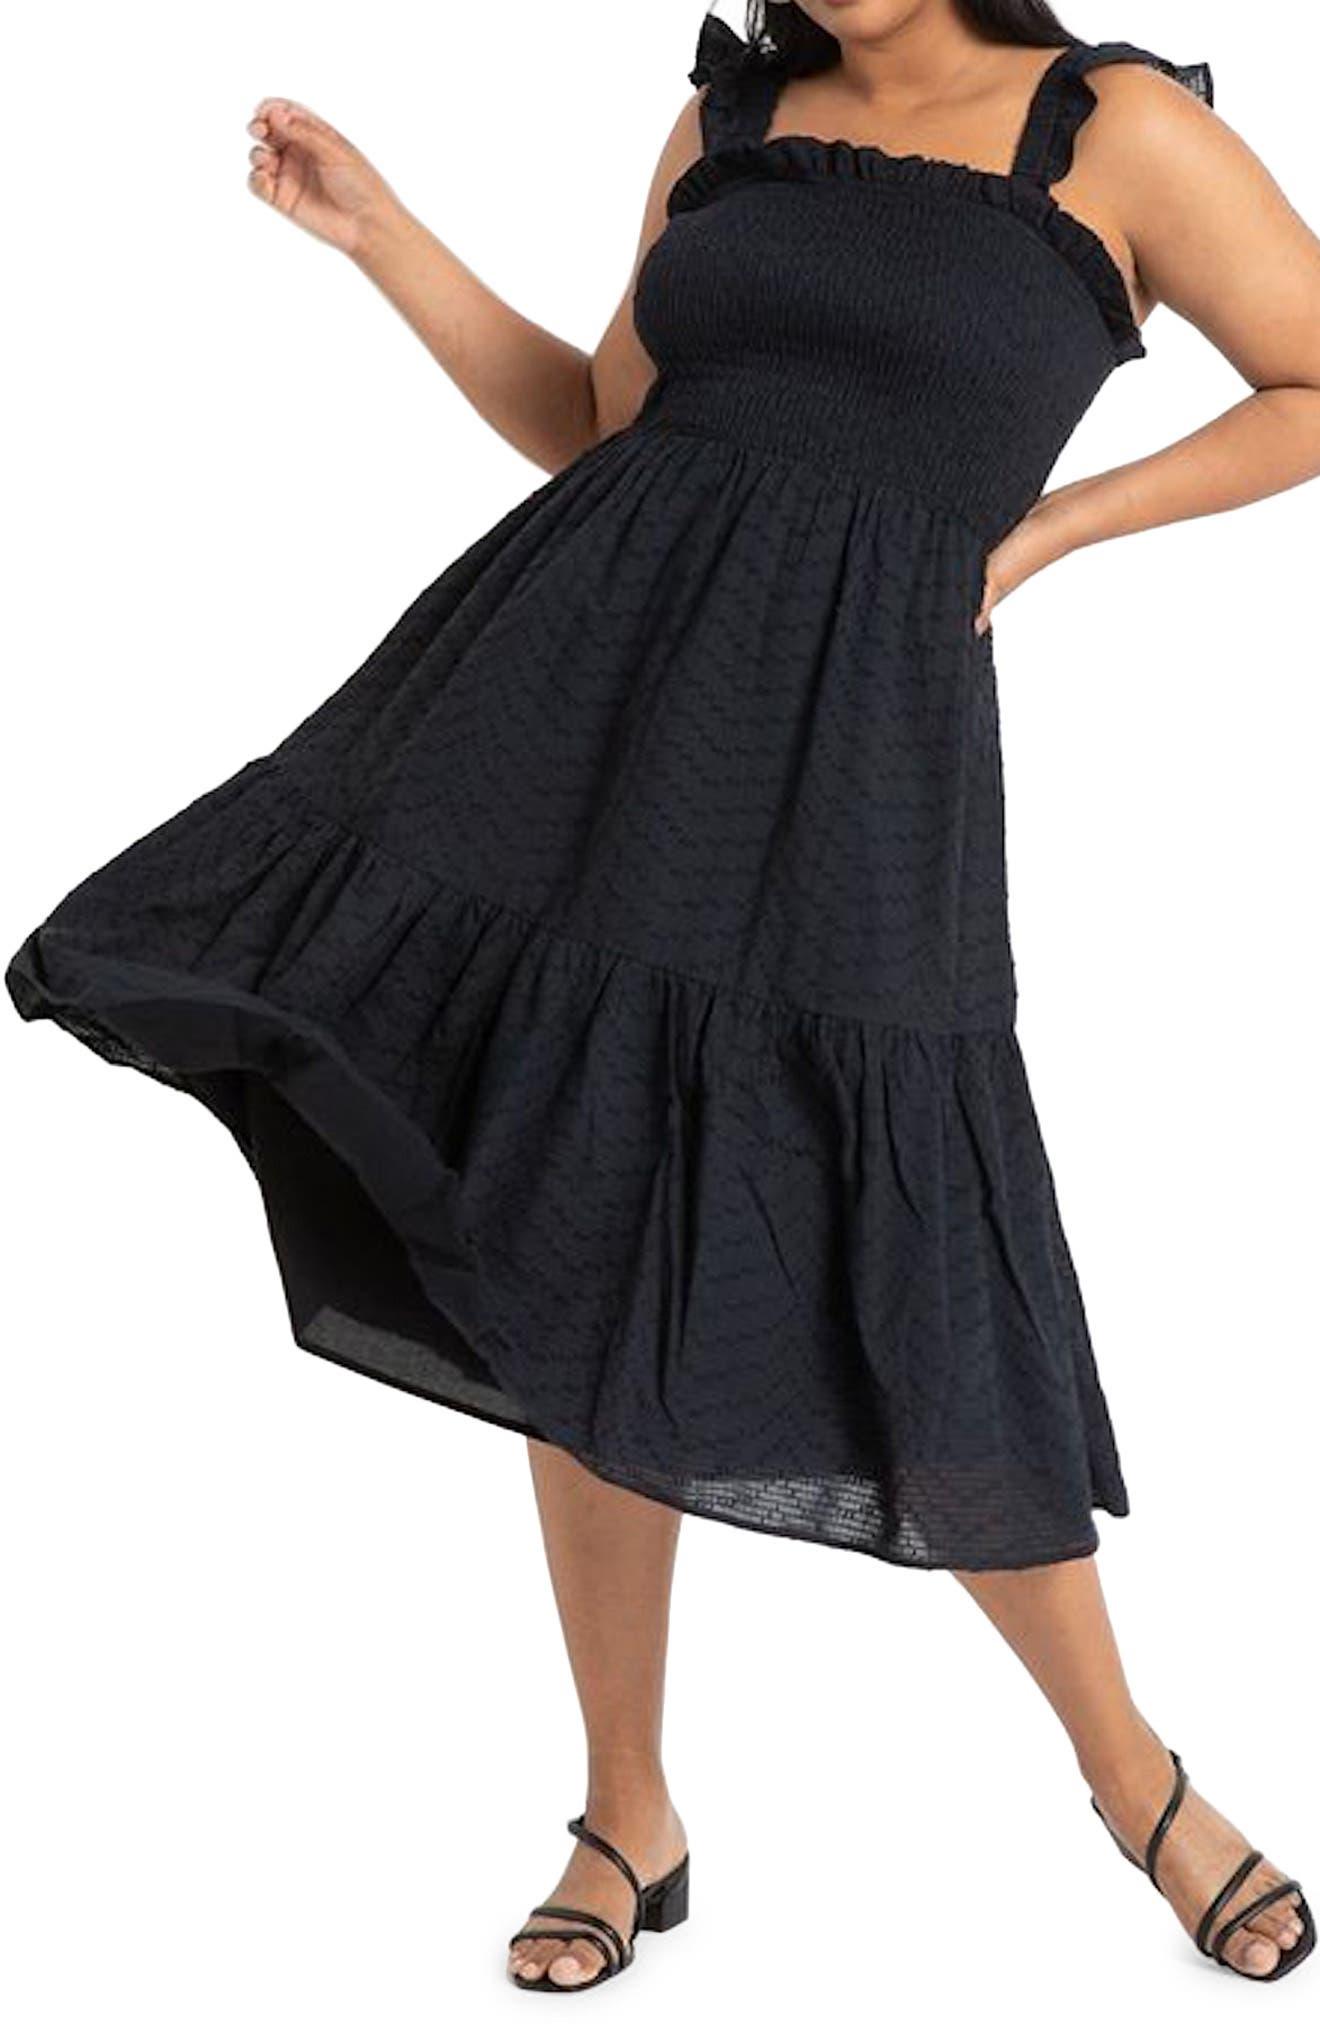 Sleeveless Smocked Ruffle Dress